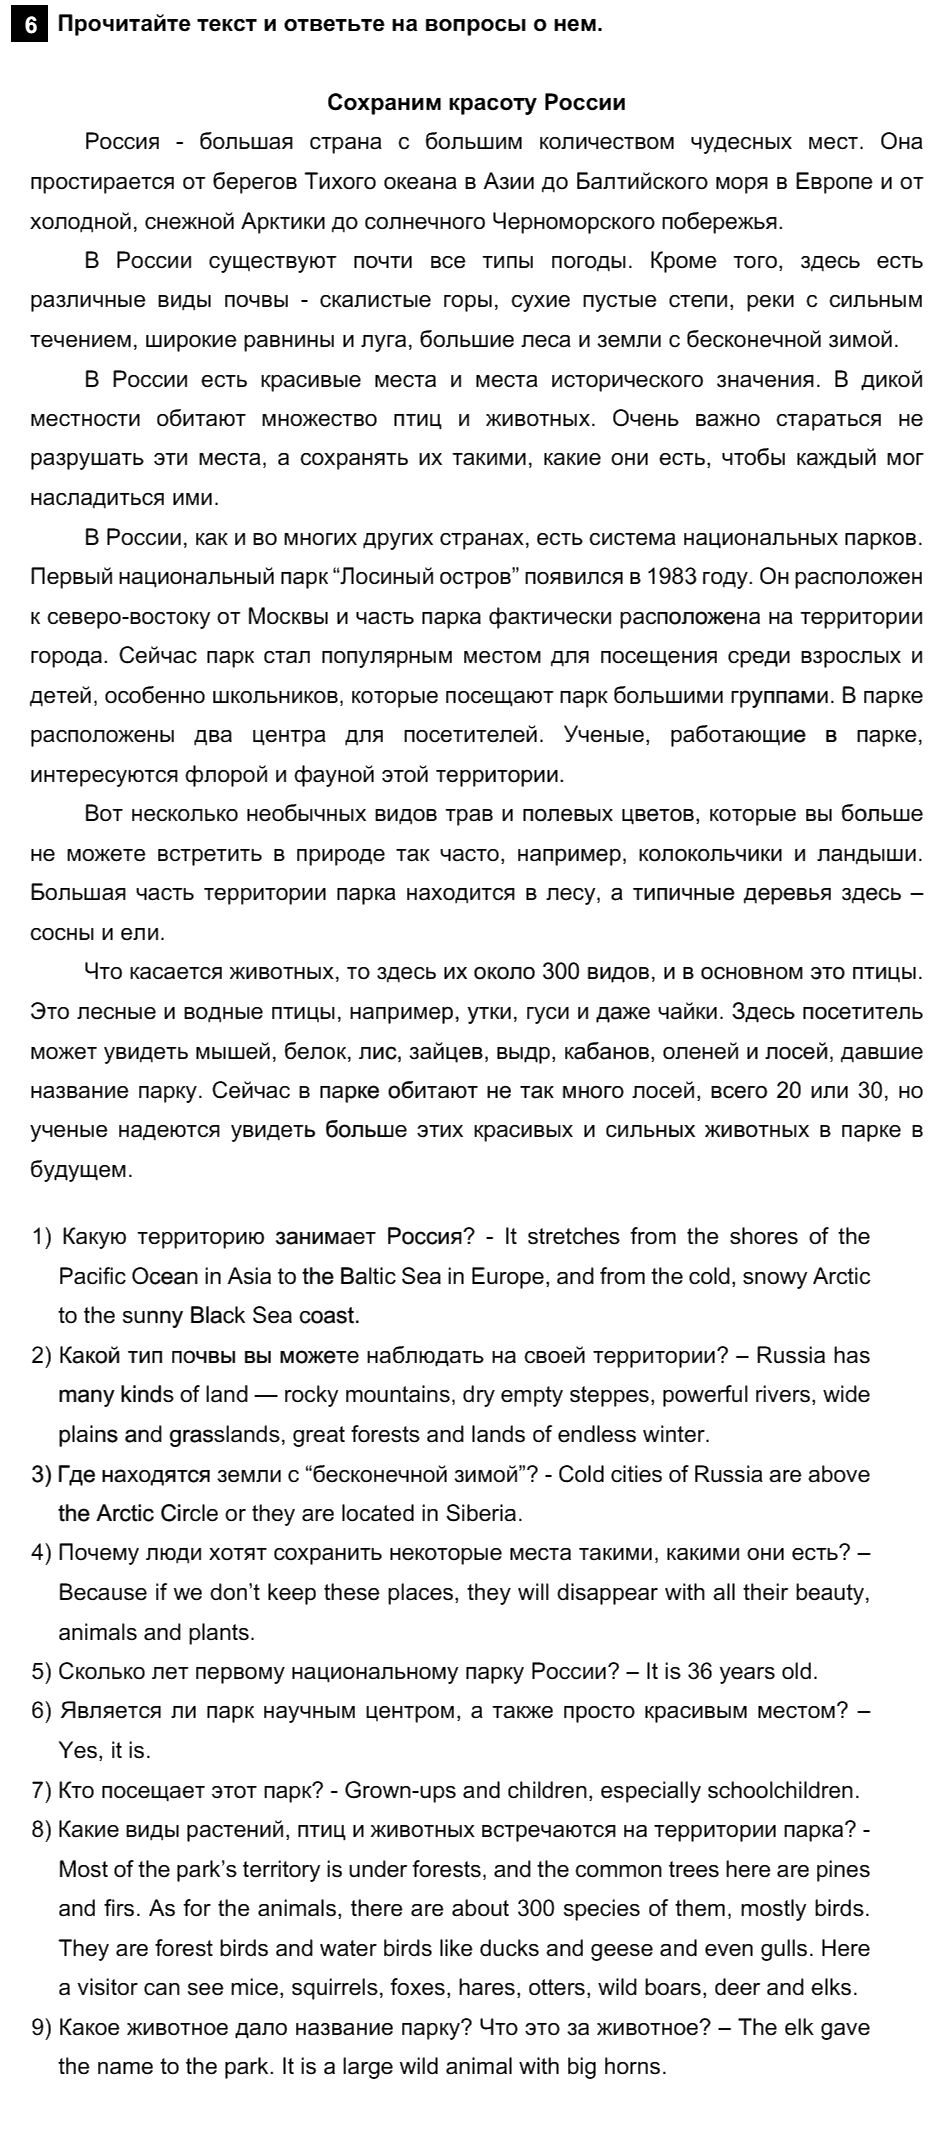 Английский язык 7 класс Афанасьева О. В. Unit 5. Экология / Шаг 1: 10